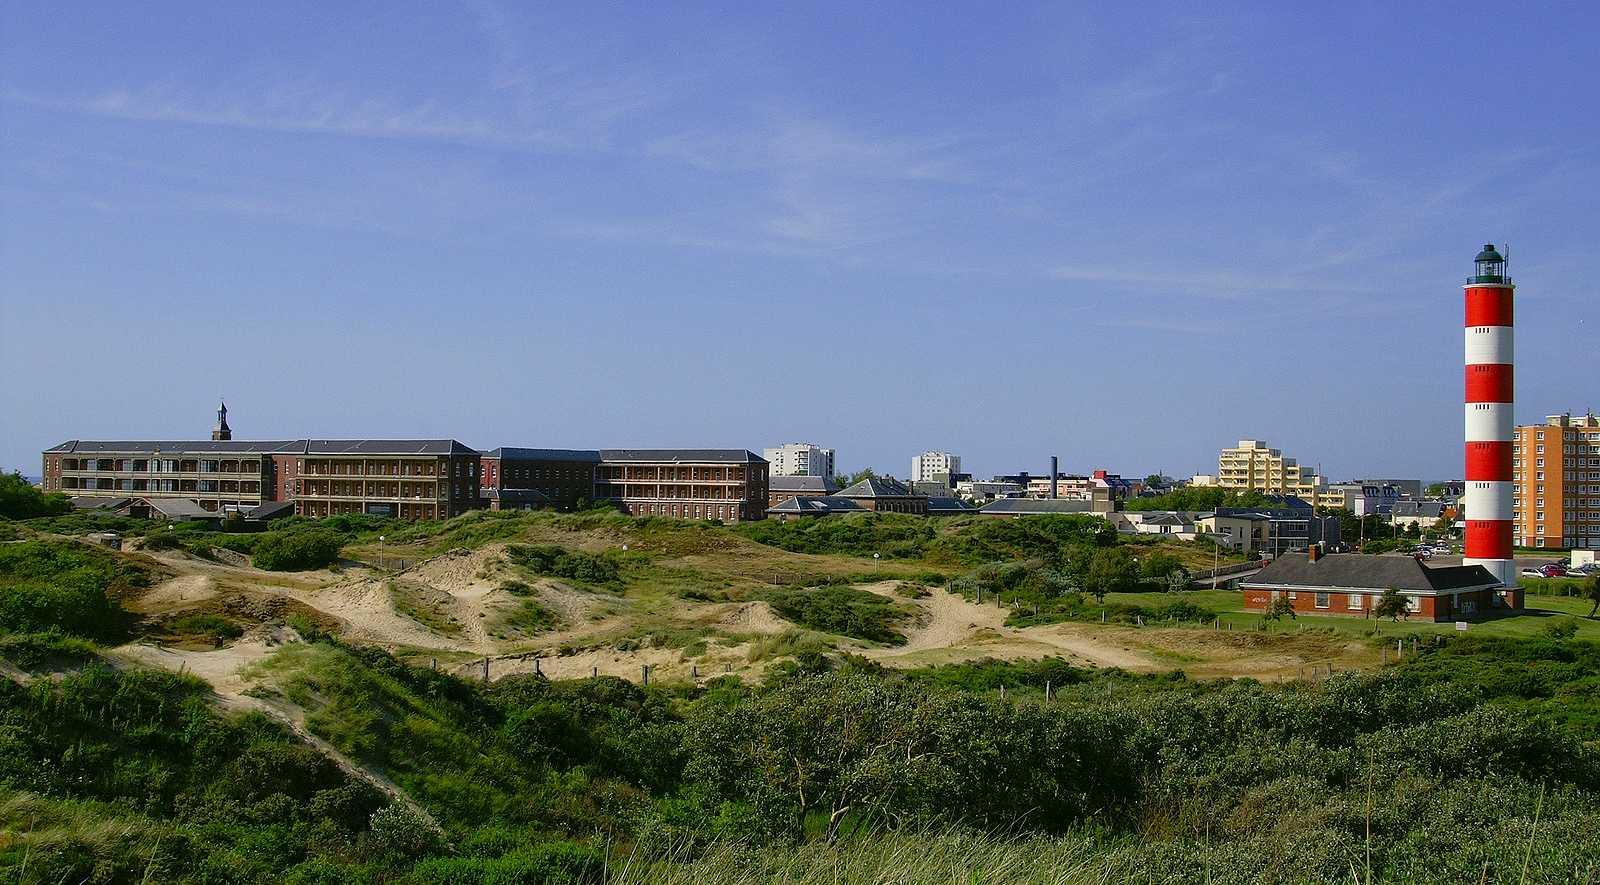 Le Phare de Berck-sur-Mer